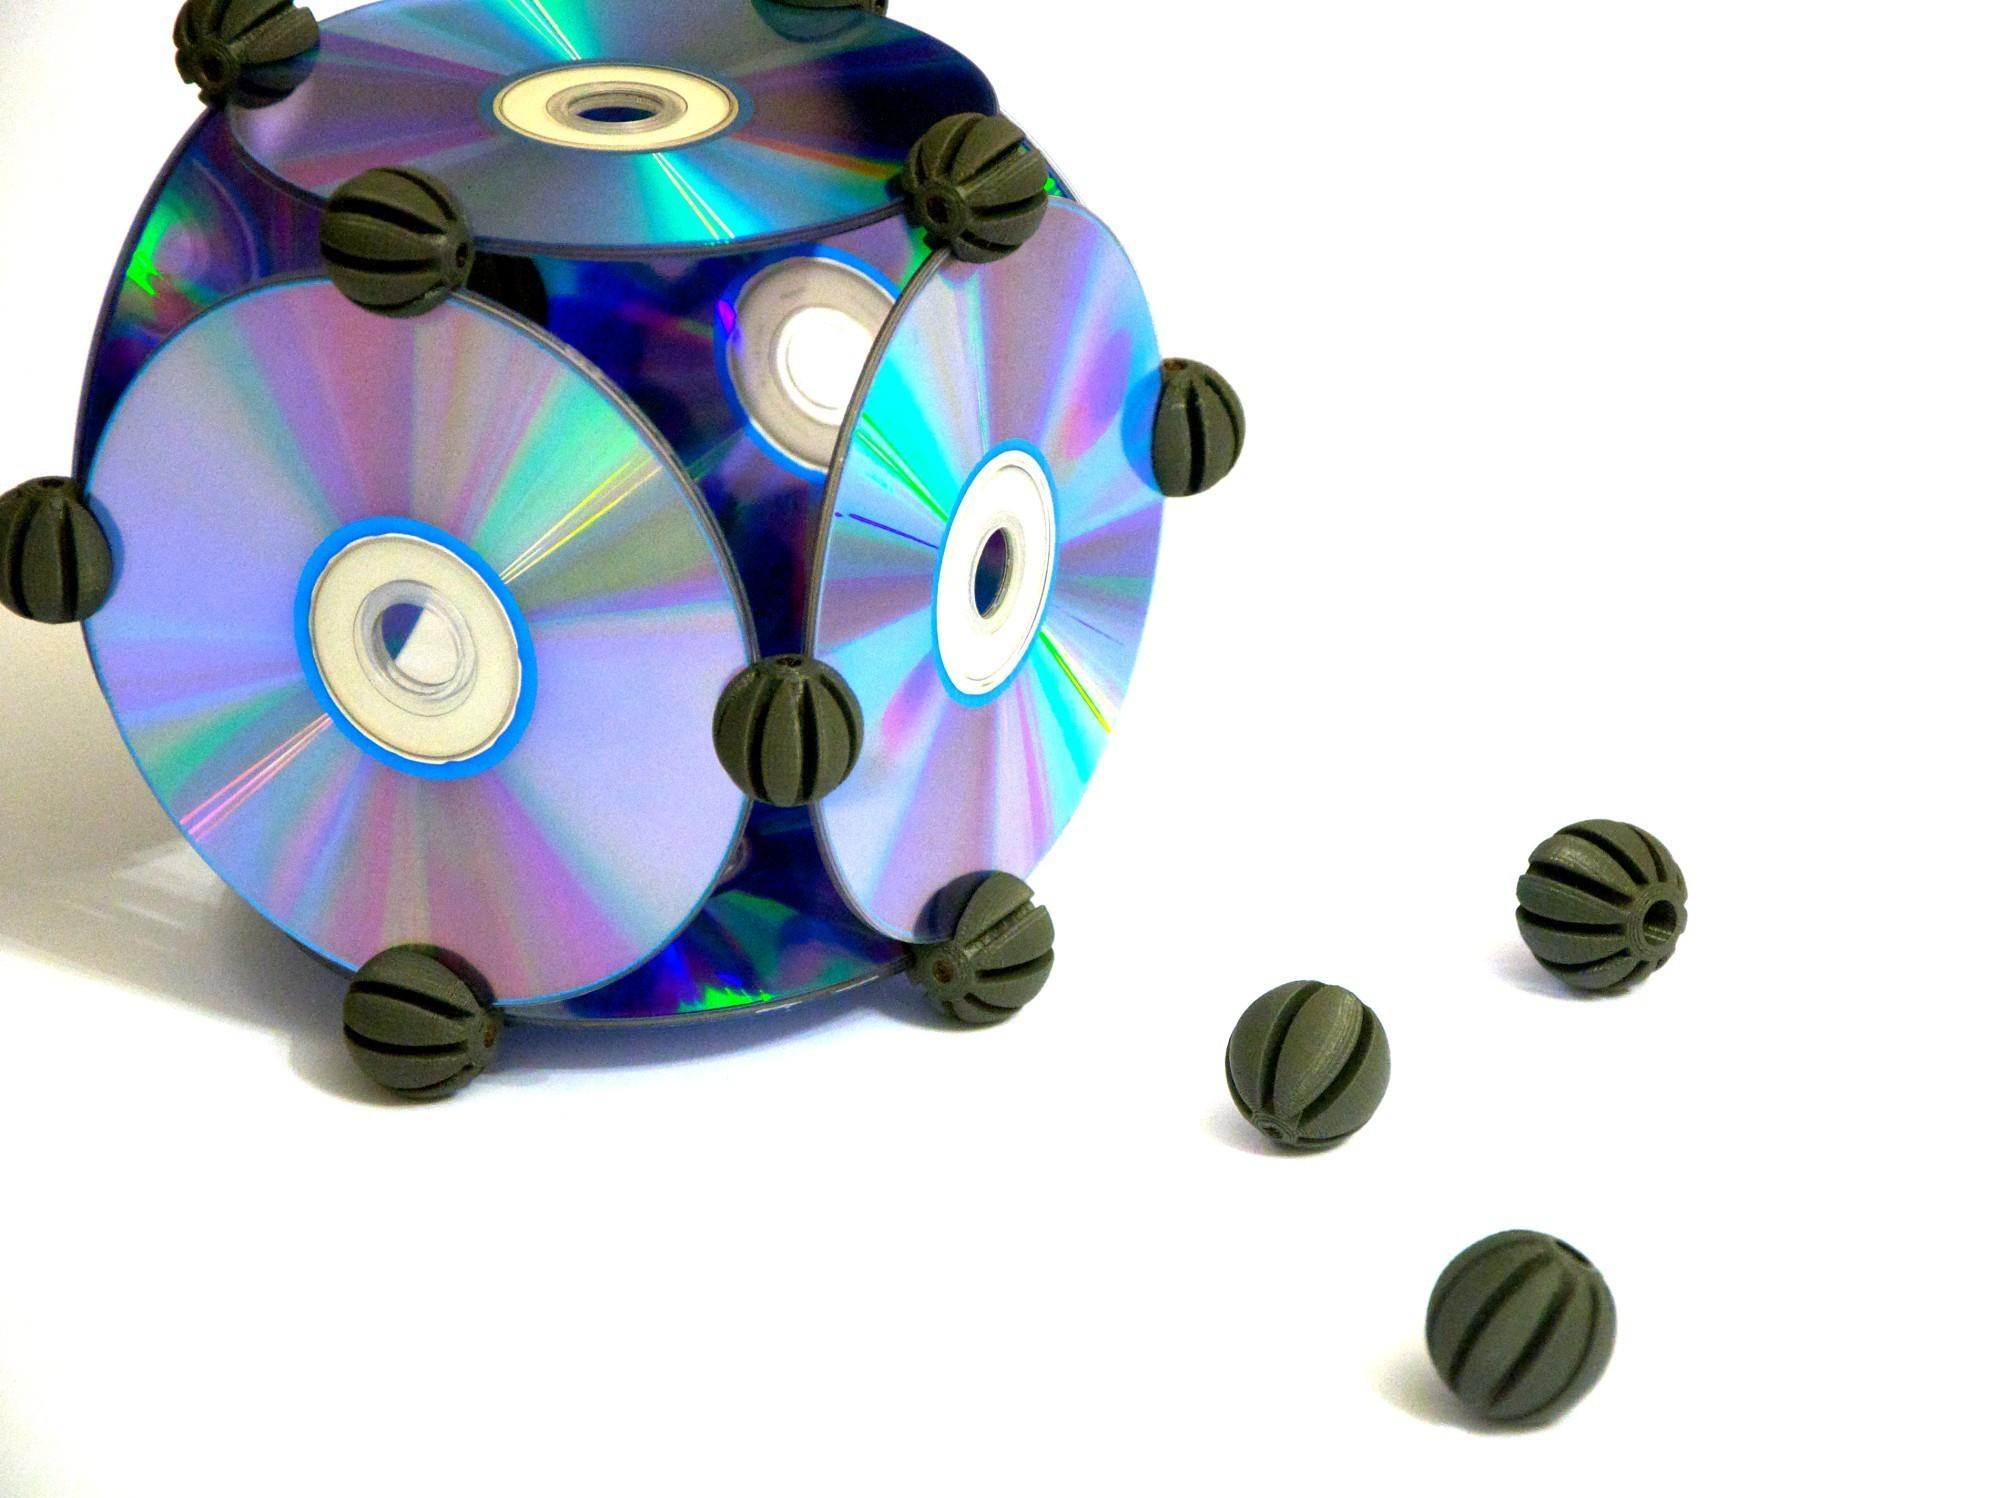 CDBITS_5.jpg Download free STL file CDBITS   Expandable, modular CD and DVD connectors. • 3D printing object, Avooq